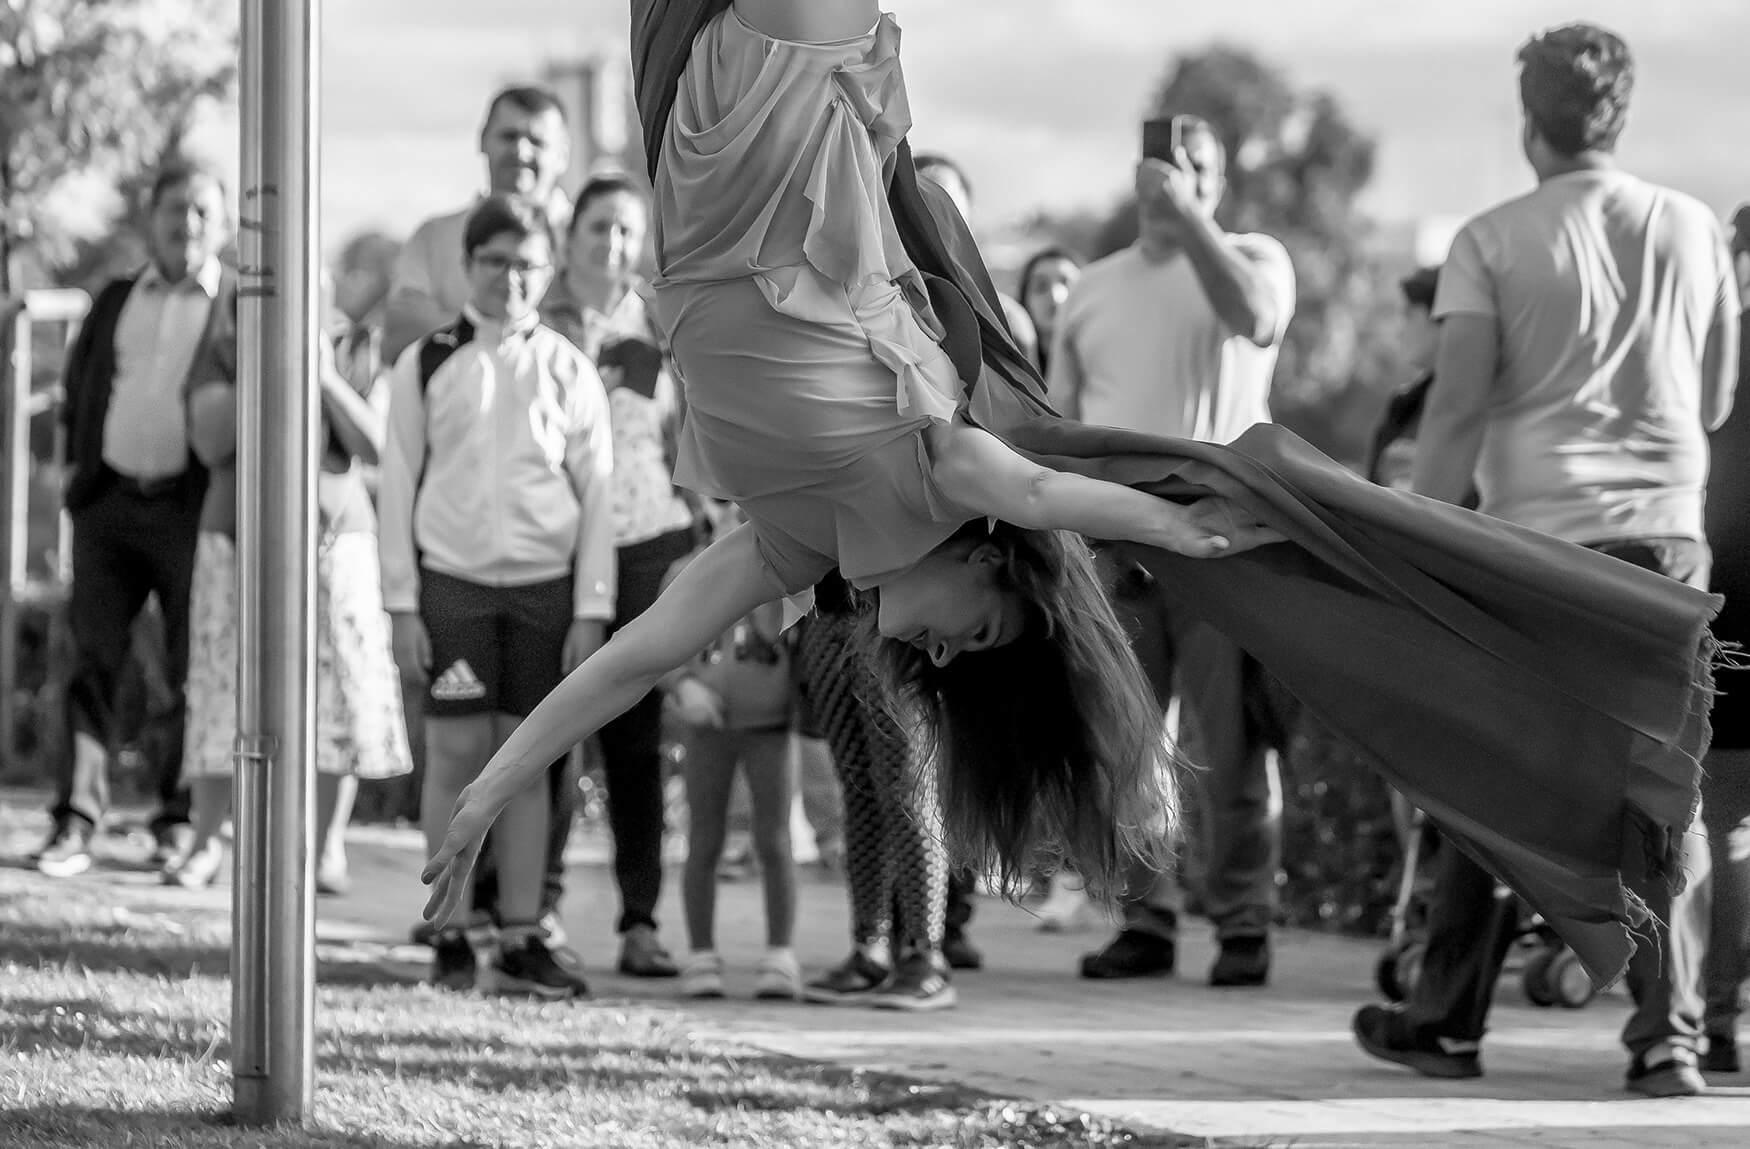 Bohorc_Ivica_Jerry_street-performance